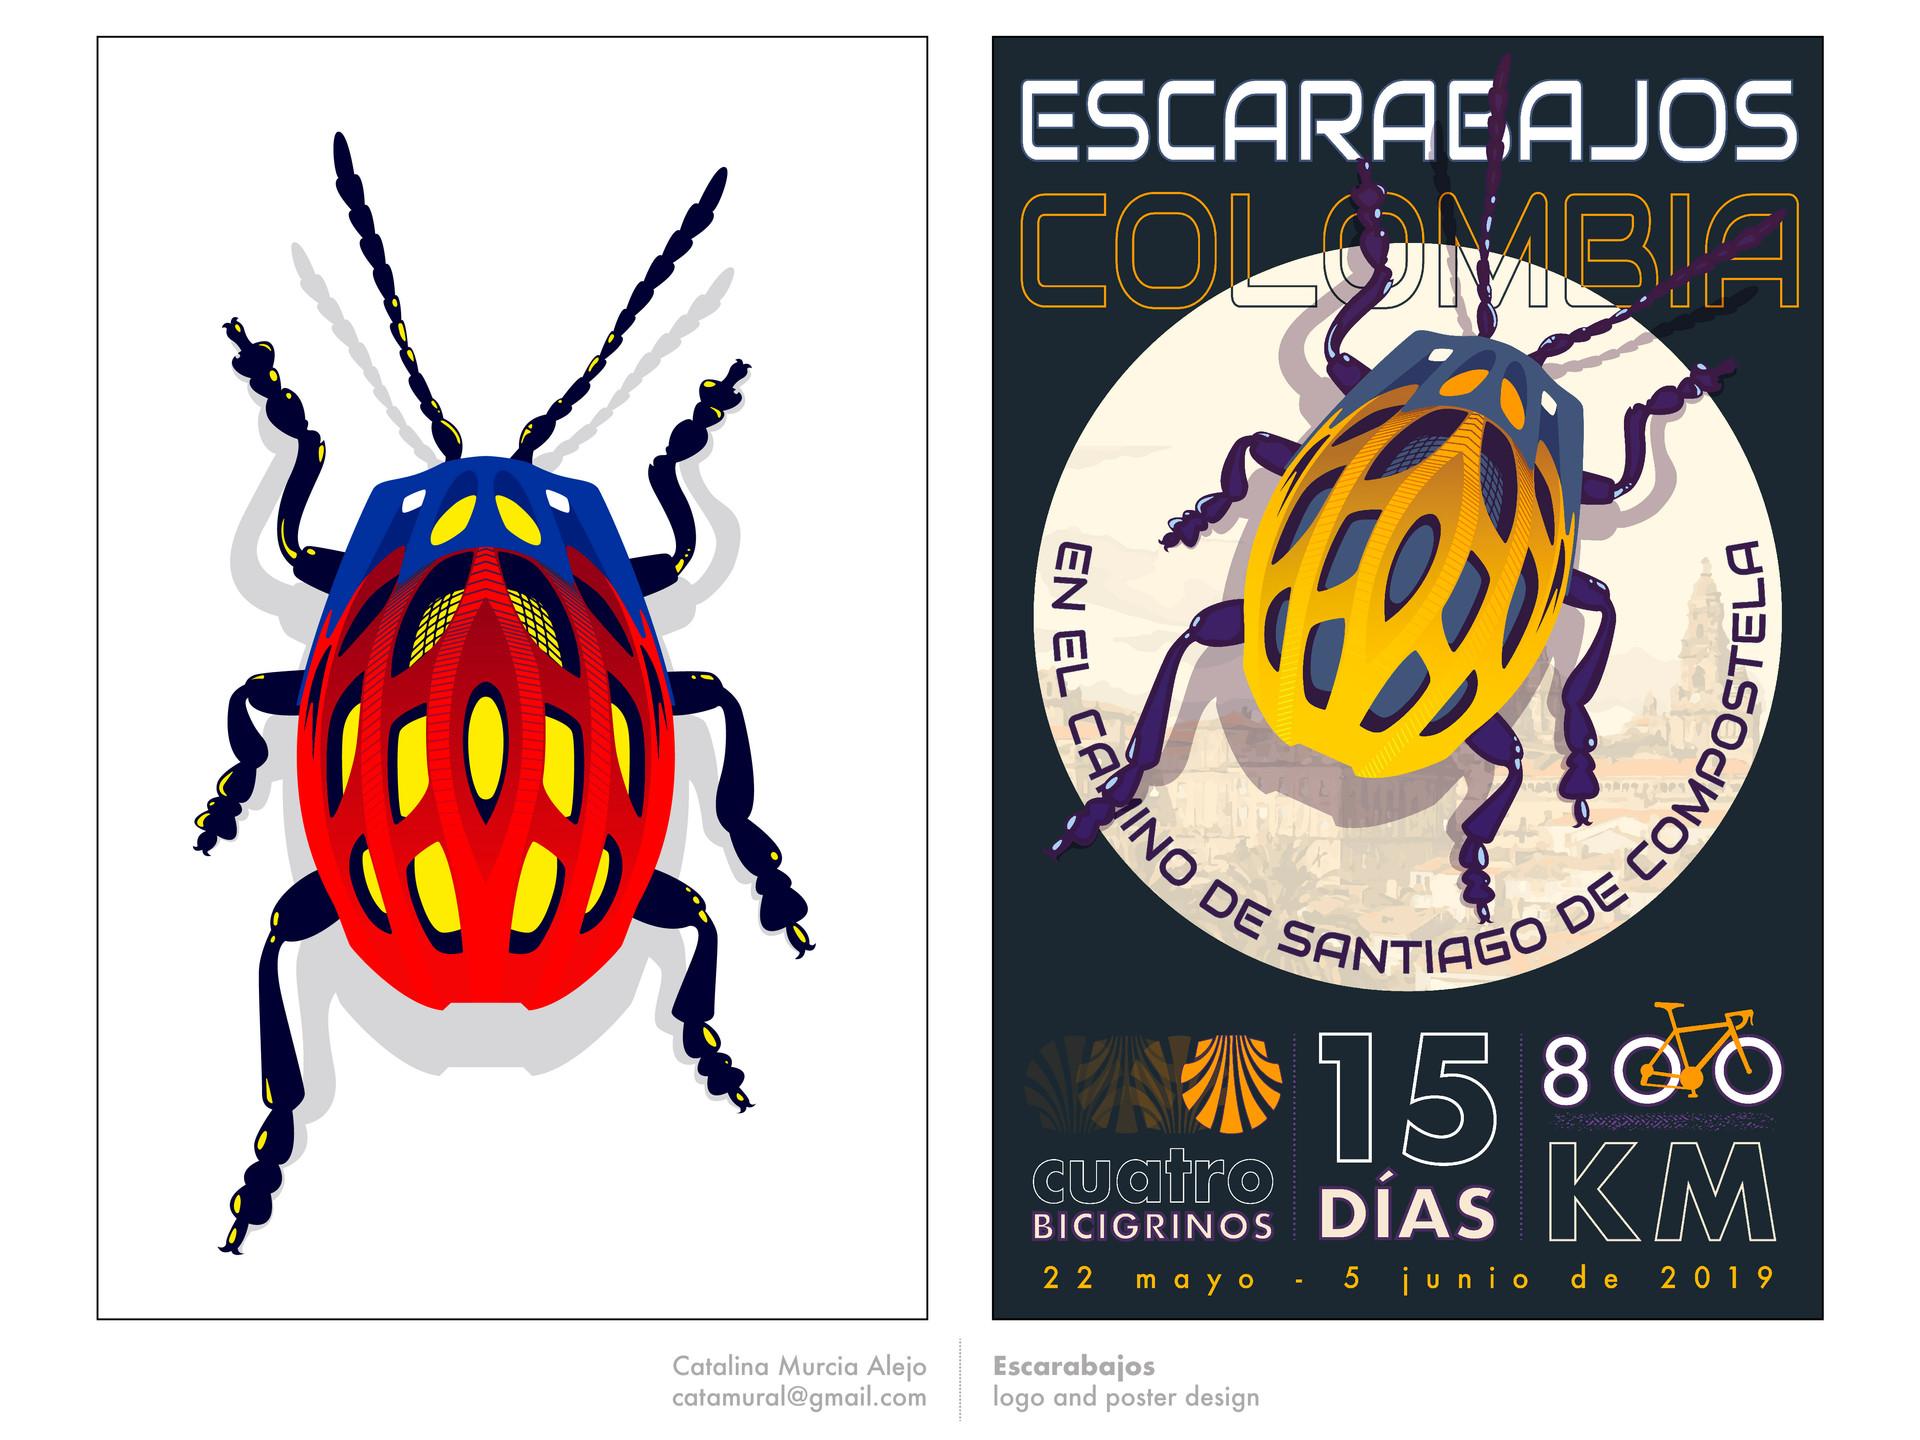 GraphicDesign-01.jpg